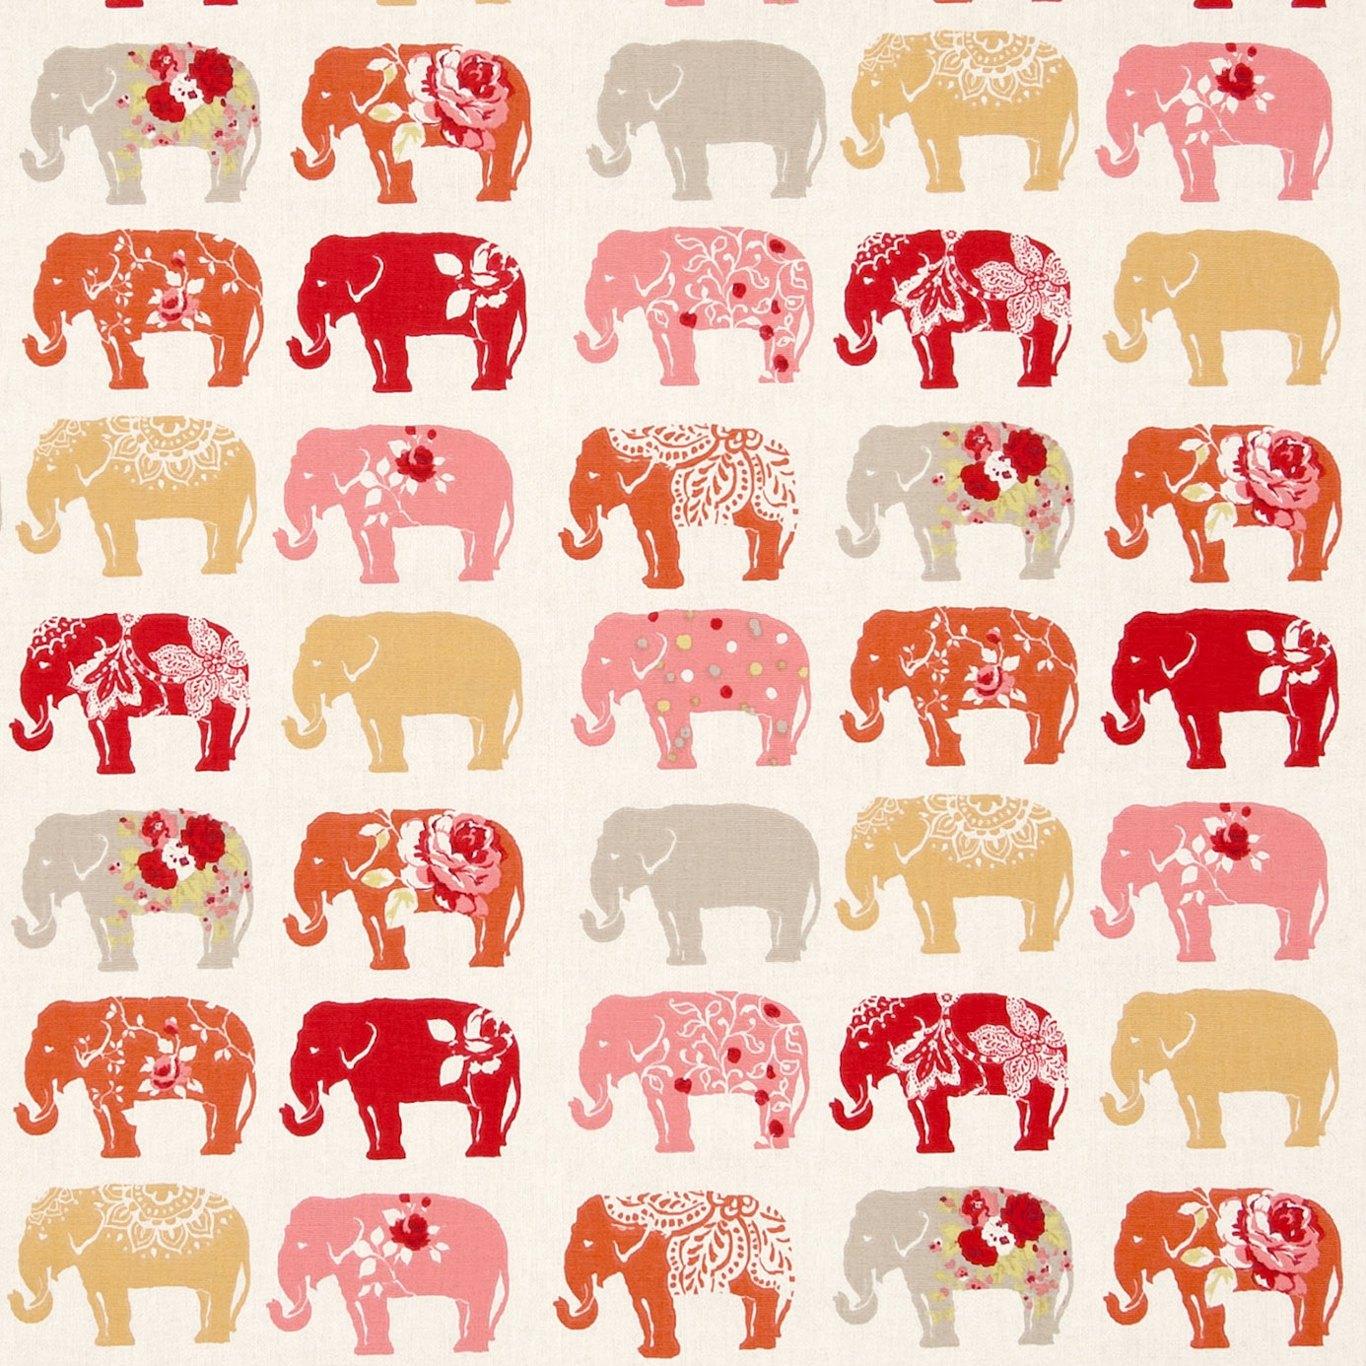 Elephants by STG